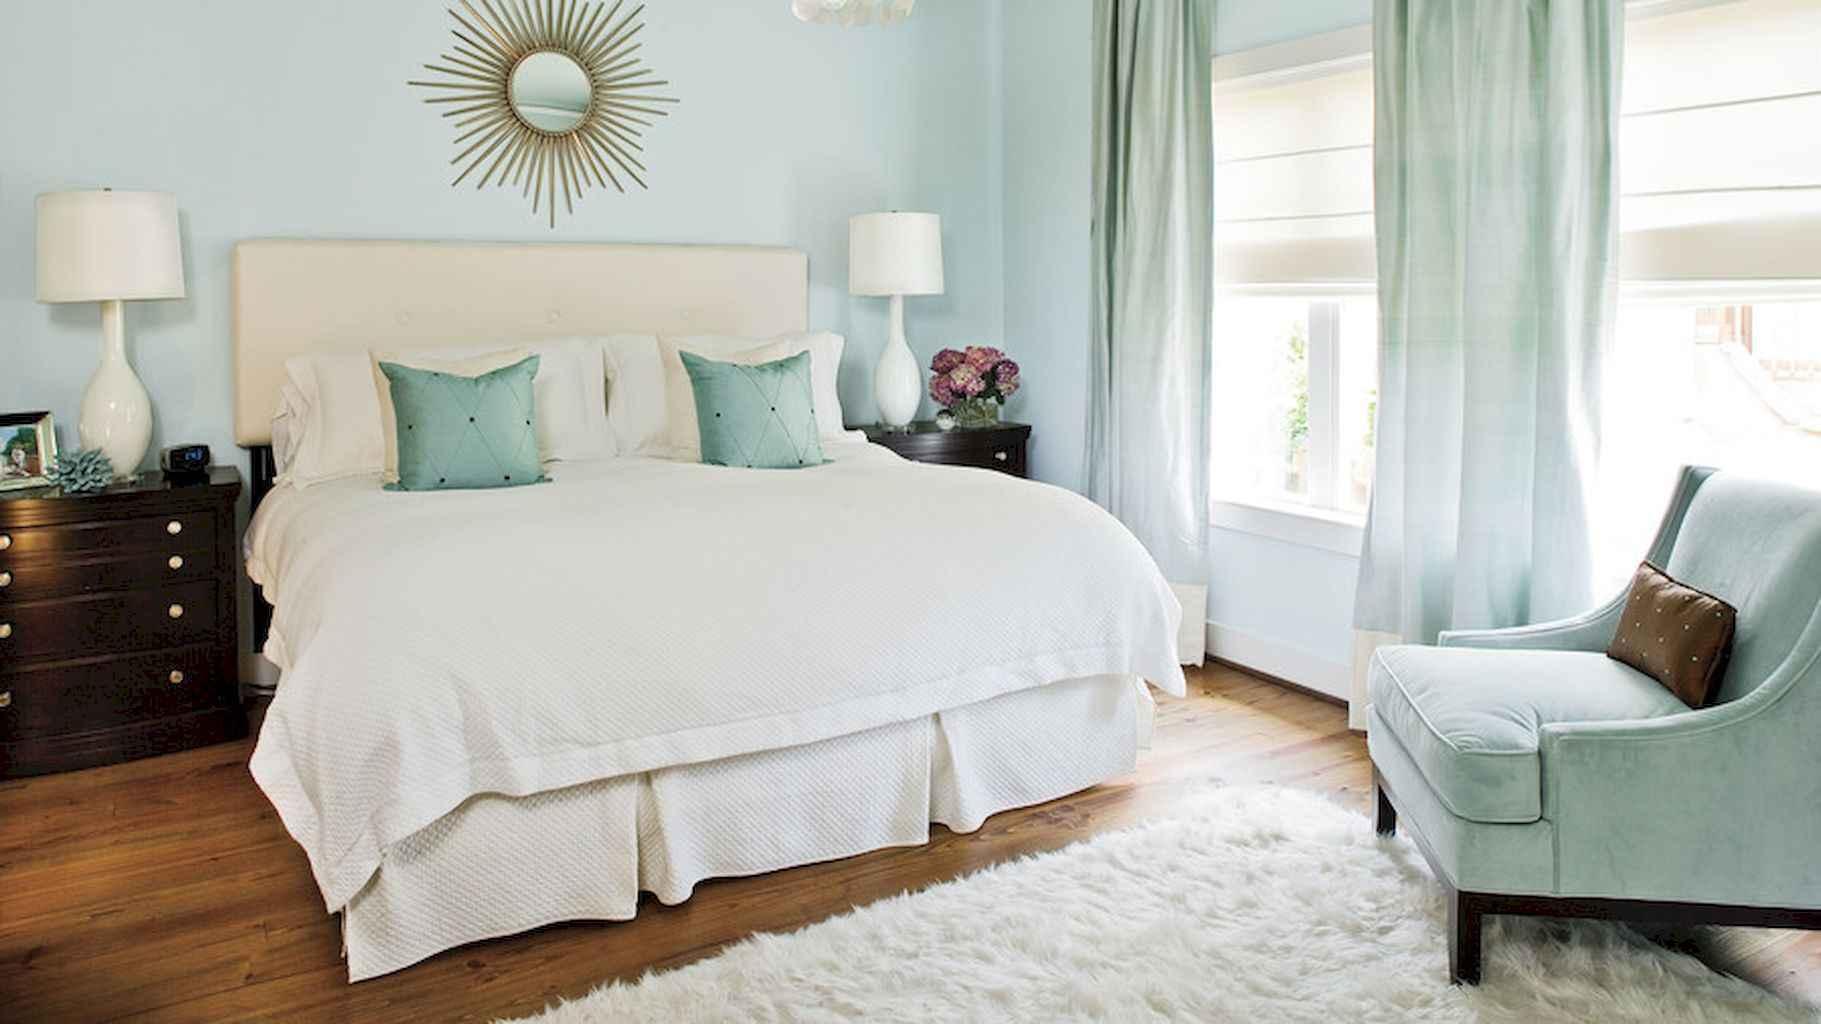 100 Stunning Farmhouse Master Bedroom Decor Ideas (44)